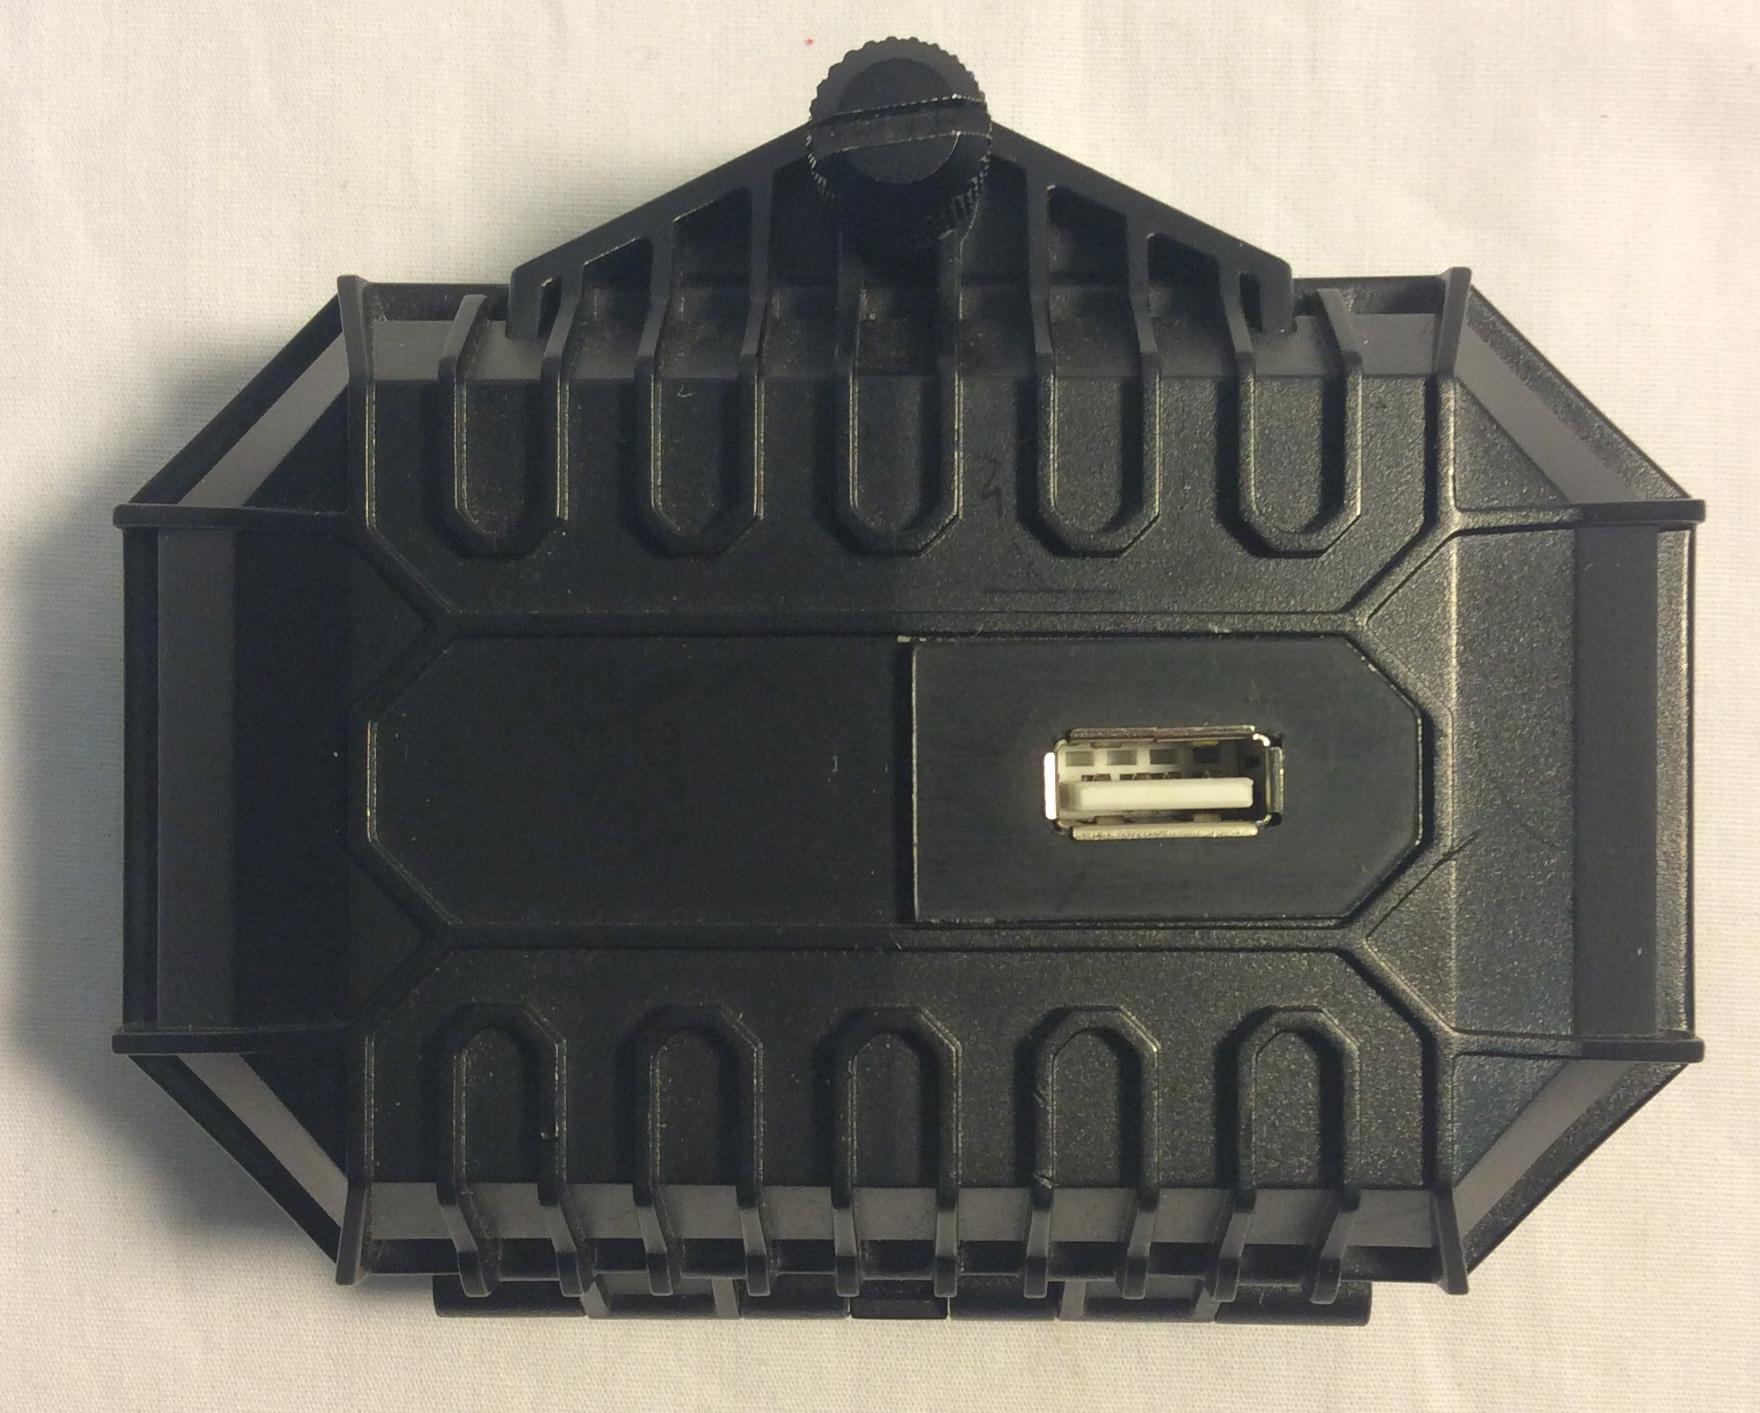 Black plastic box with USB plug